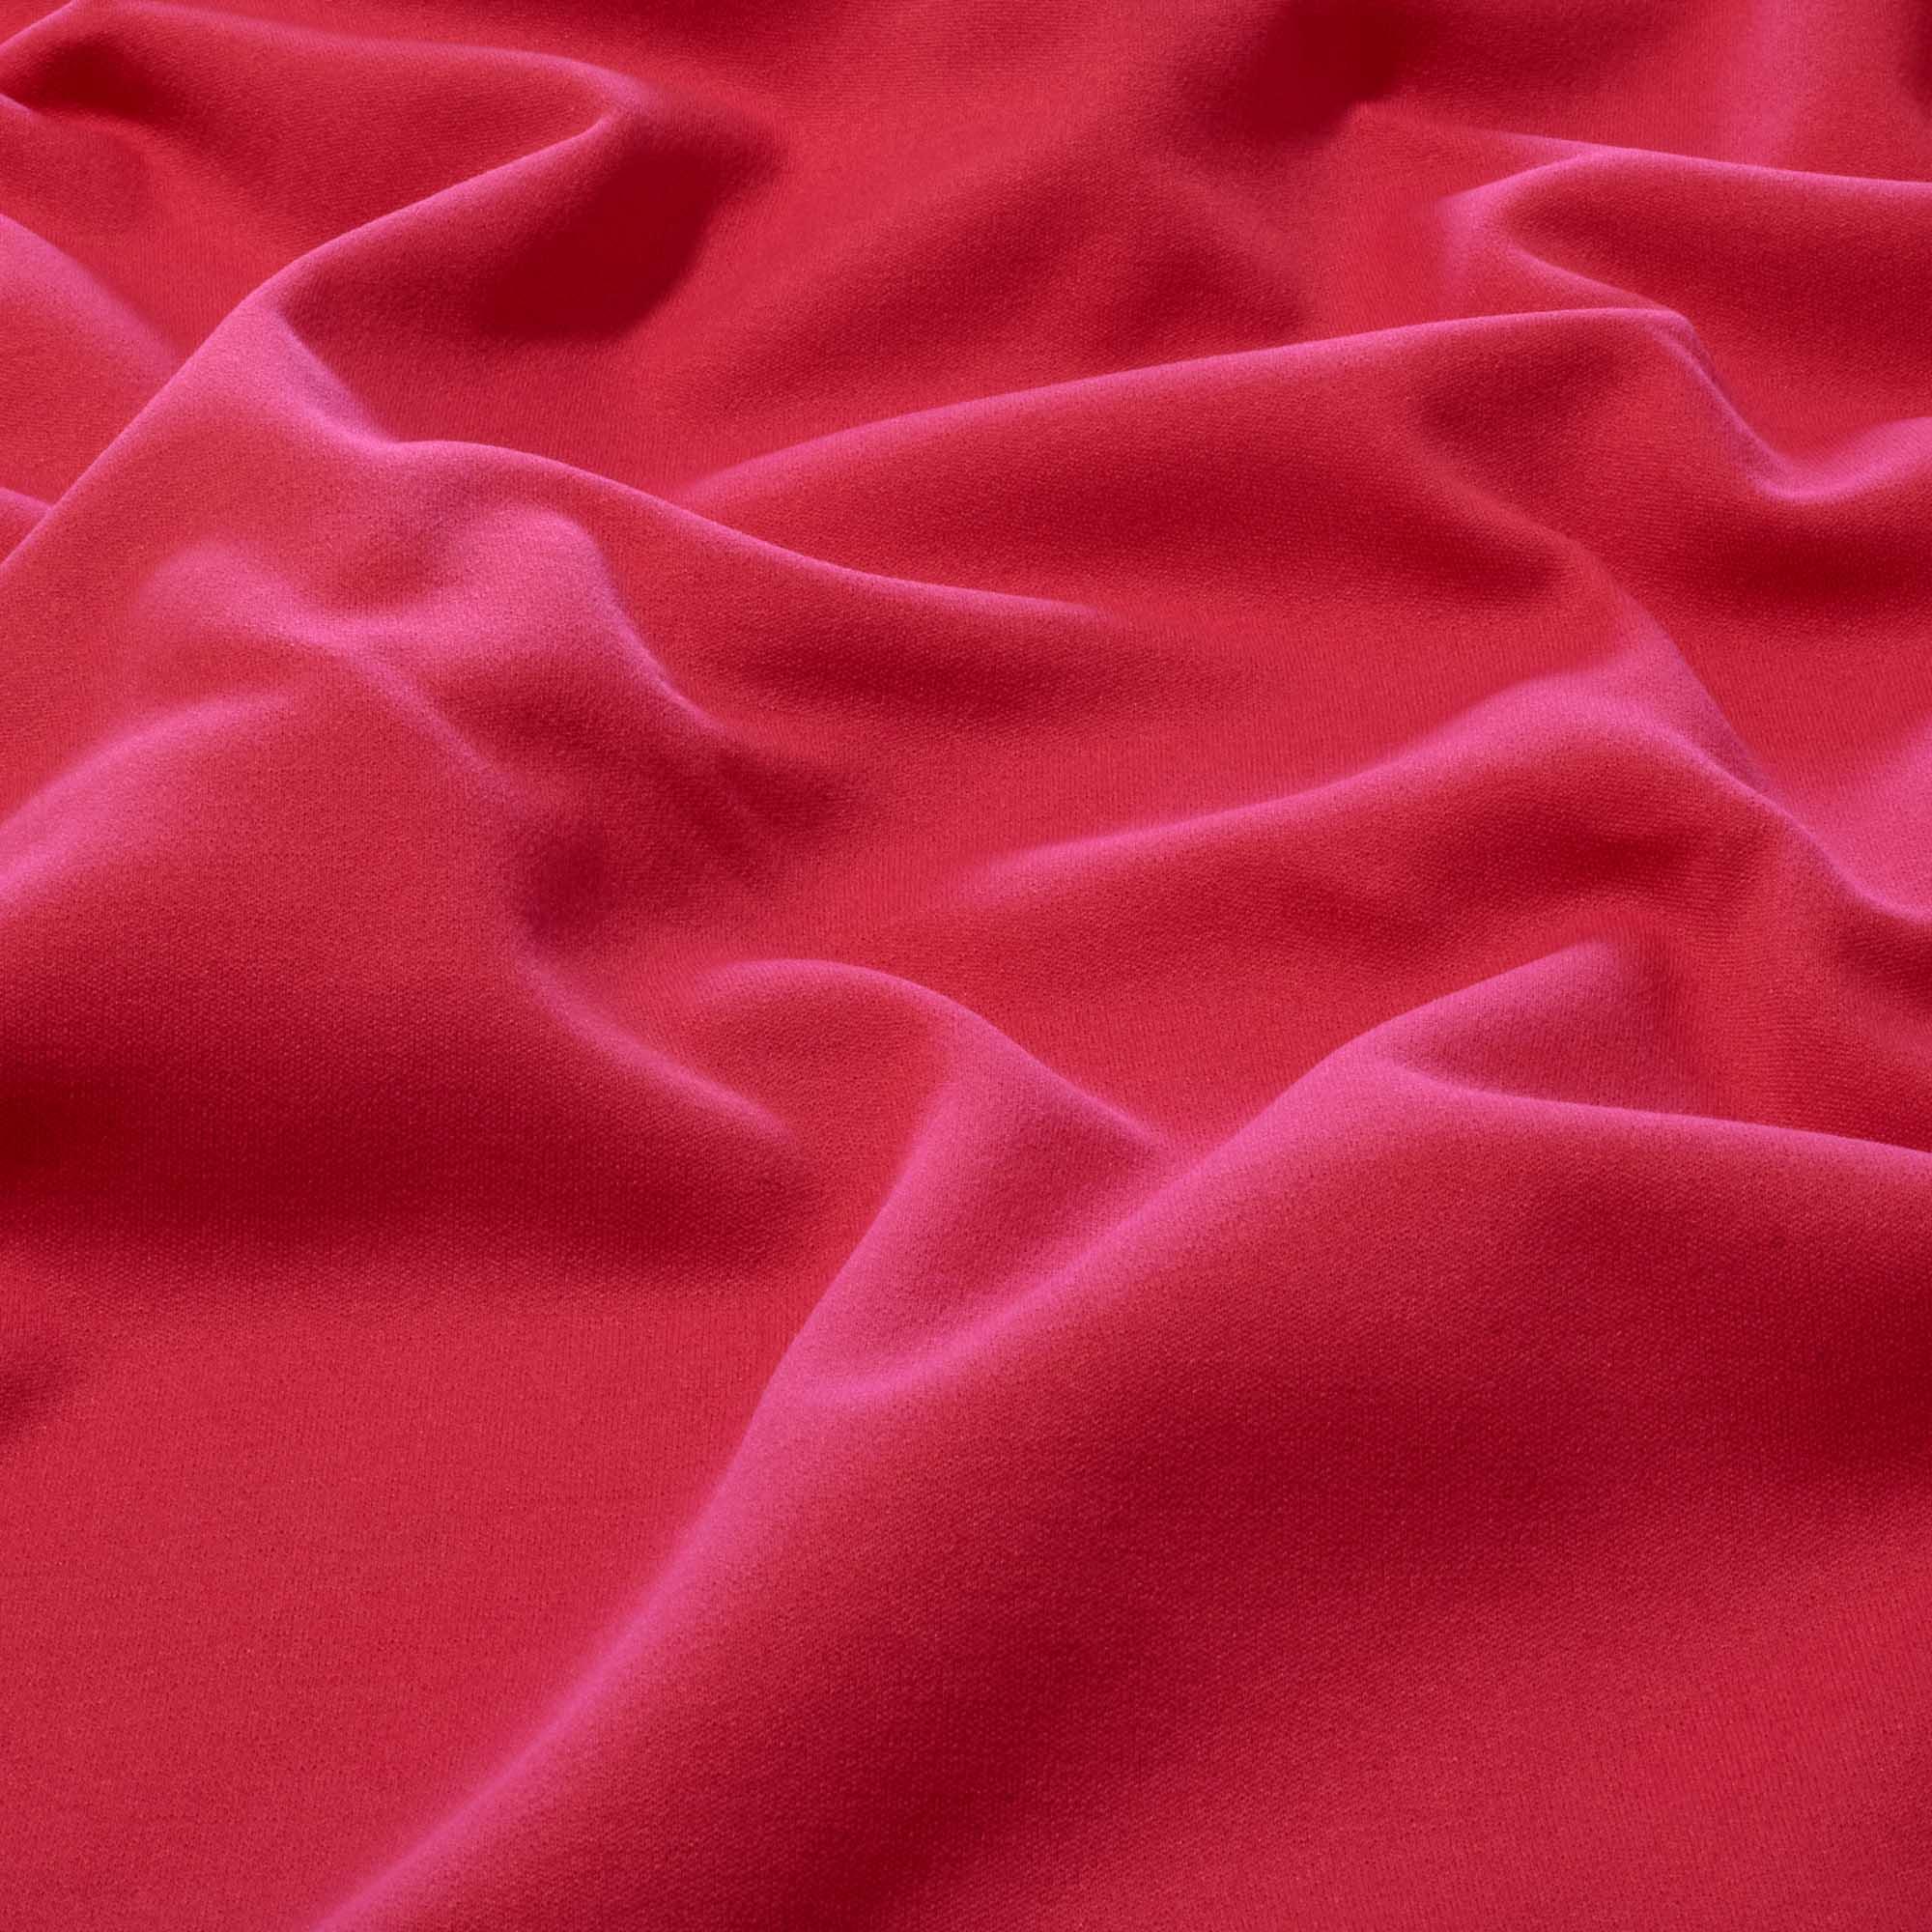 Tecido Moletom Rosa Chiclete 100% Poliester 1,20 m Largura